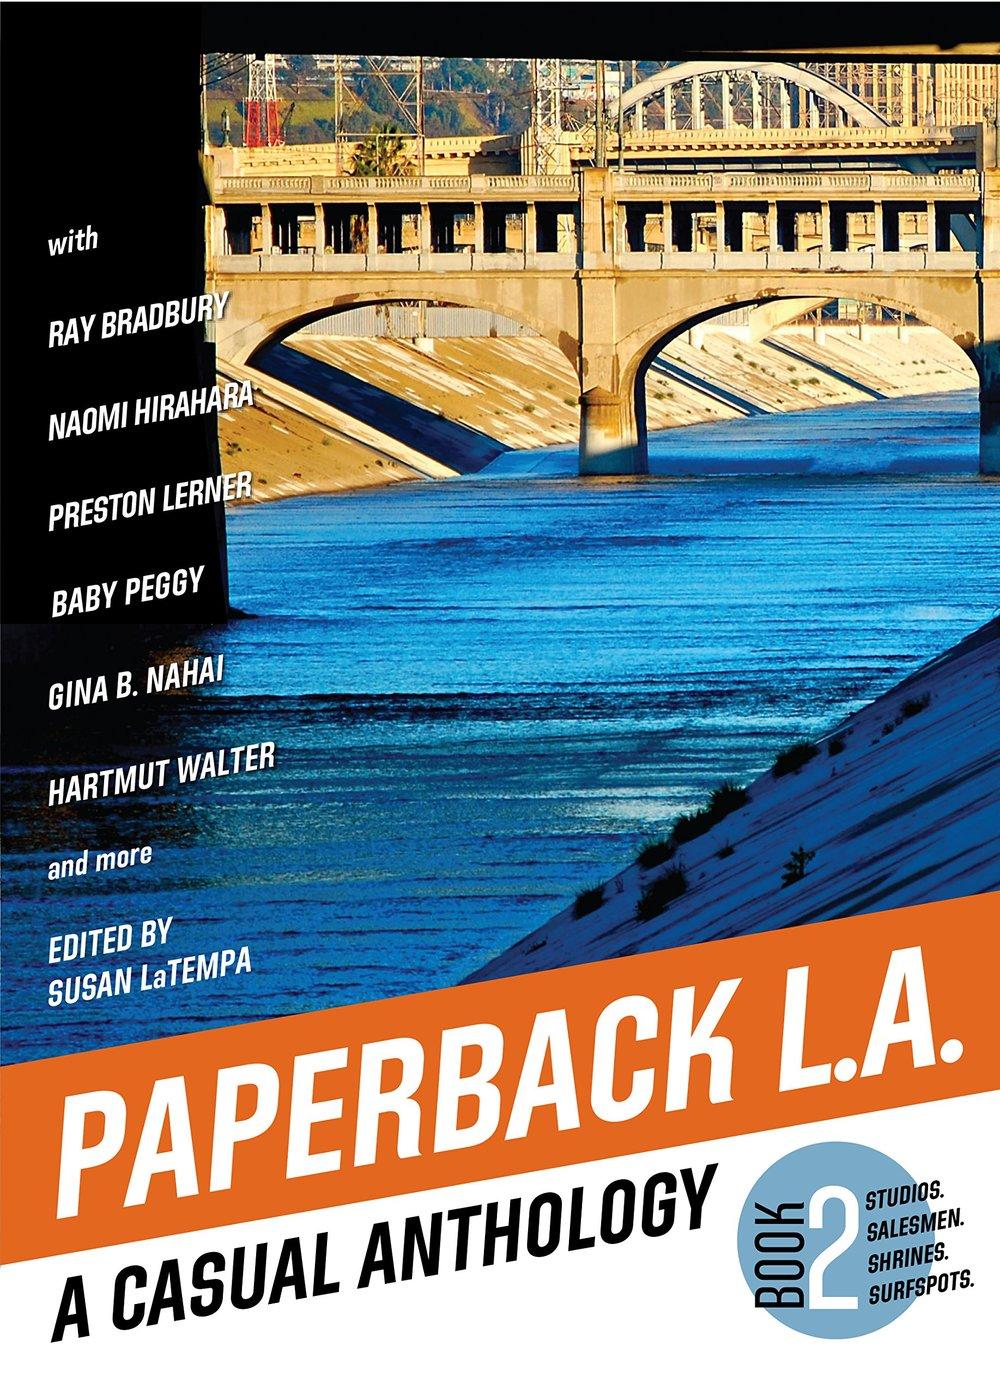 paperback la.jpg